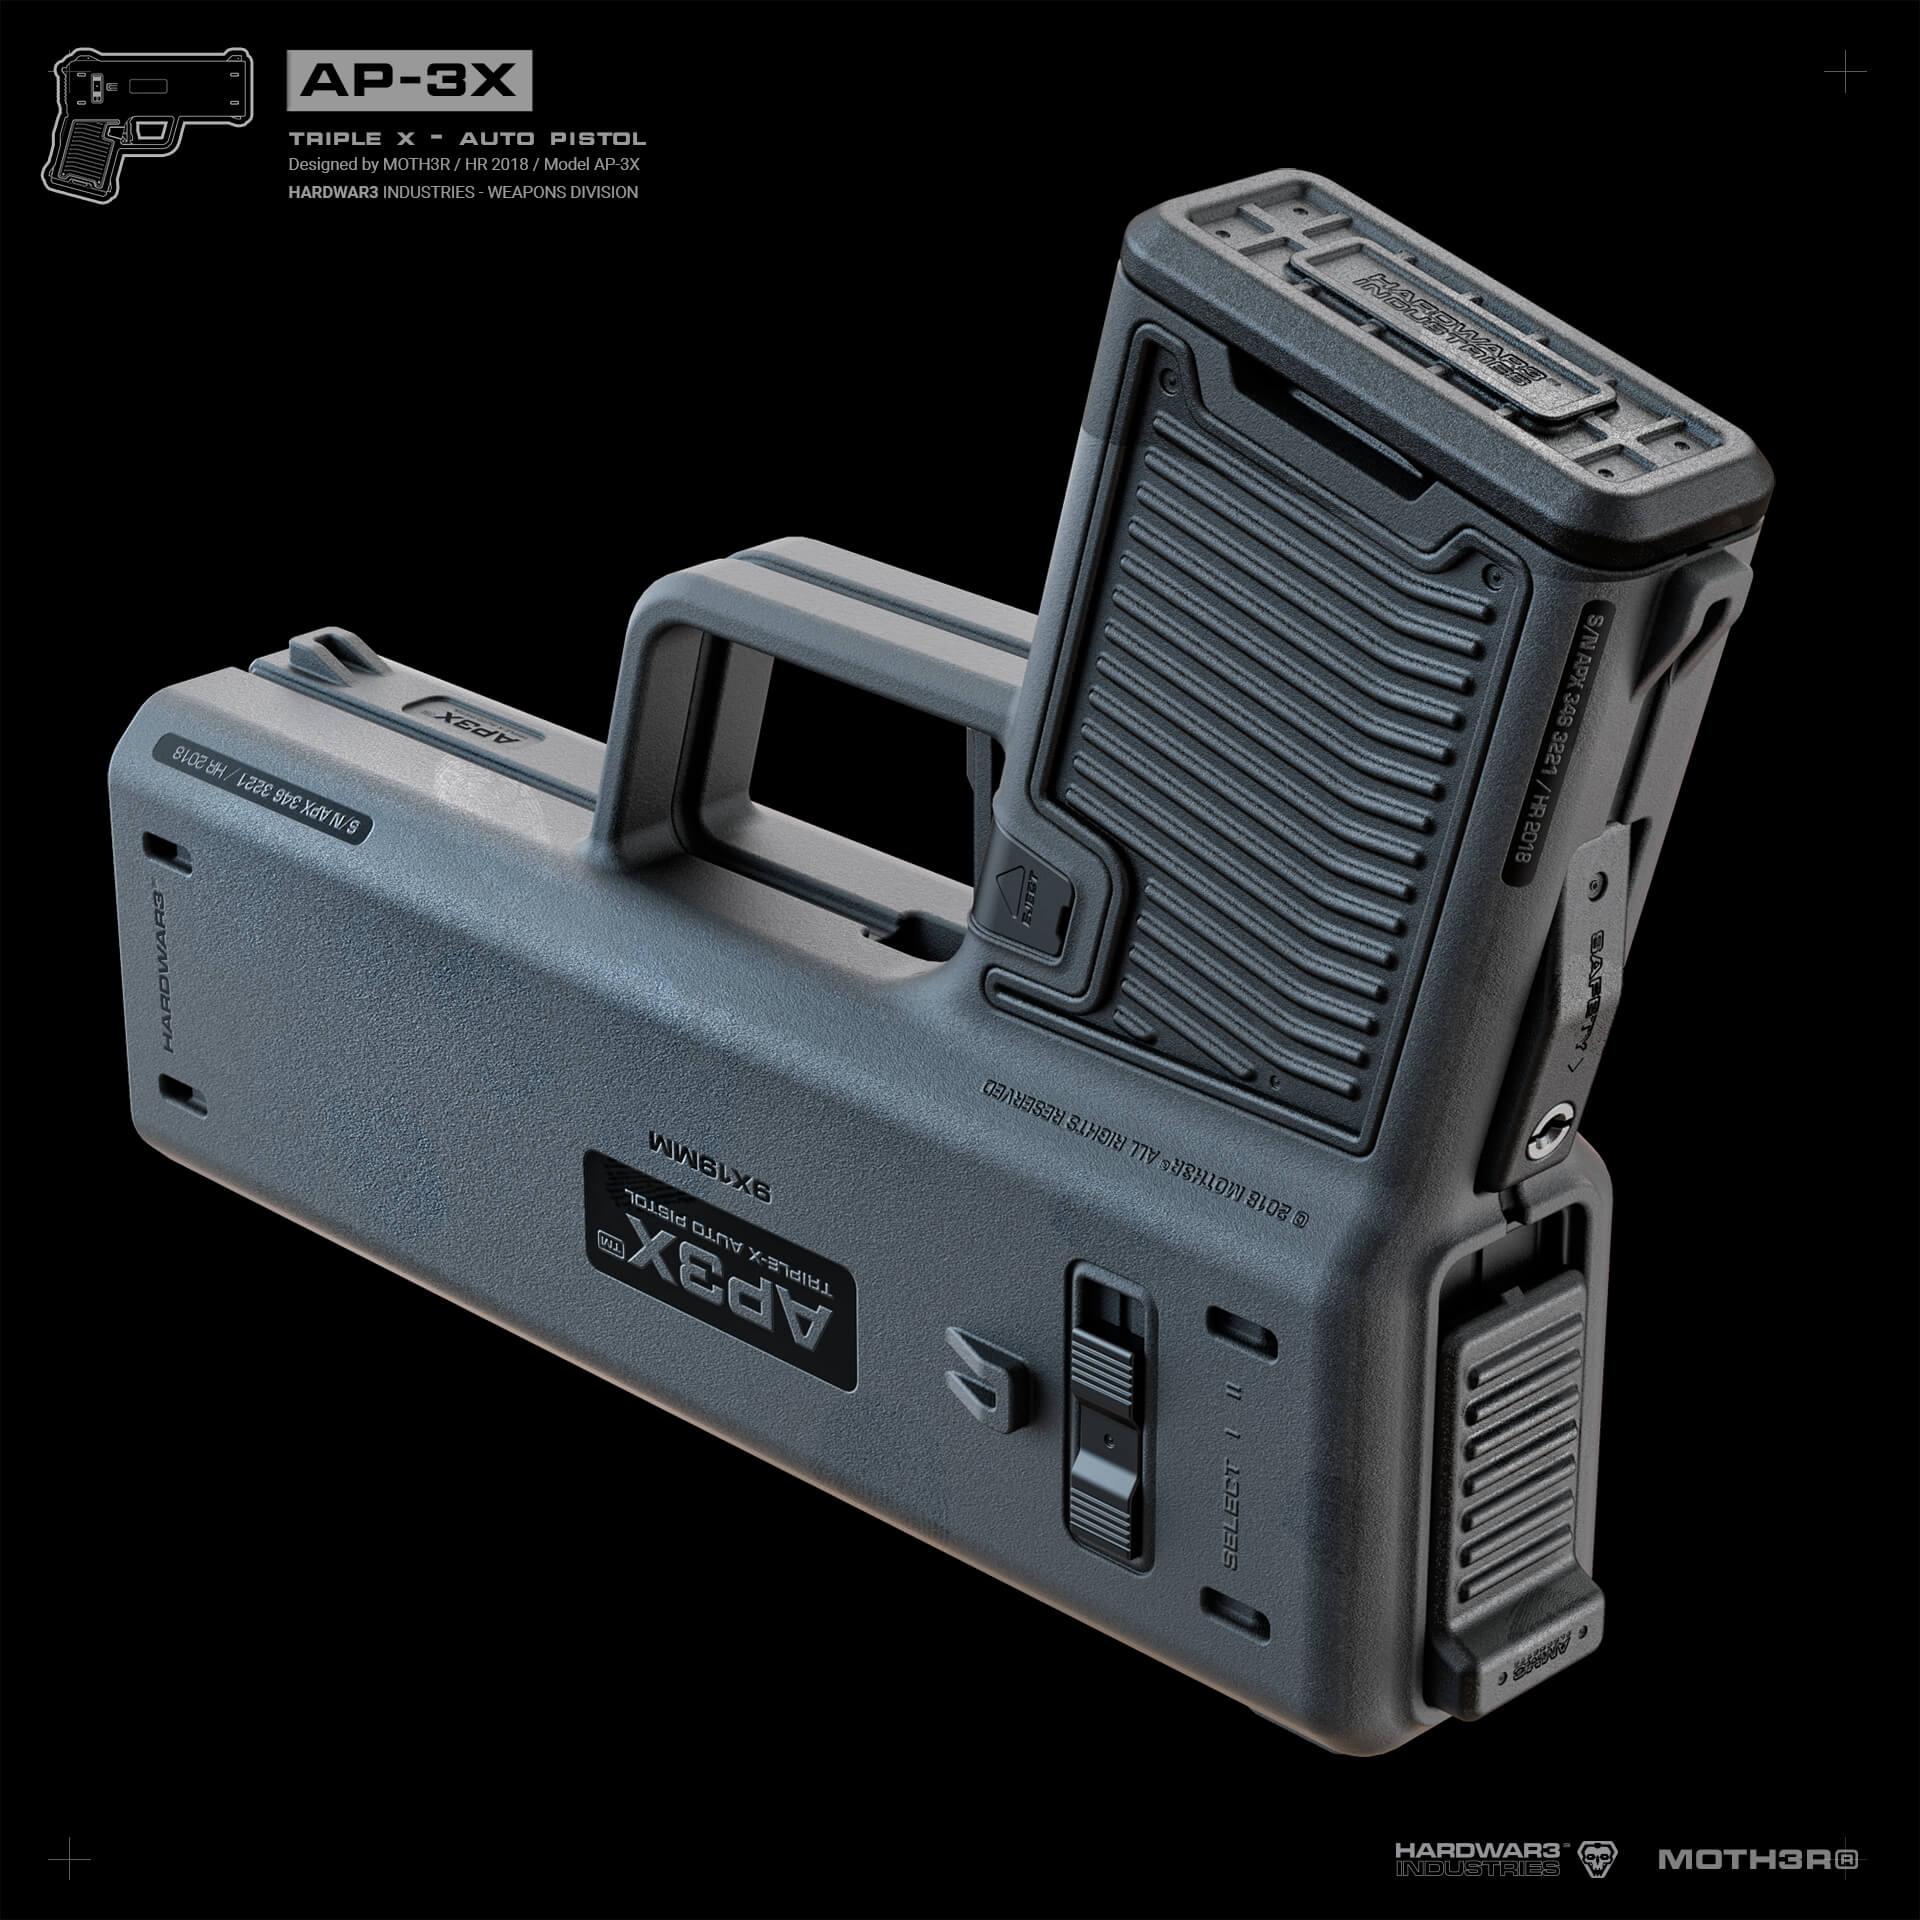 Pistol-b09.567b